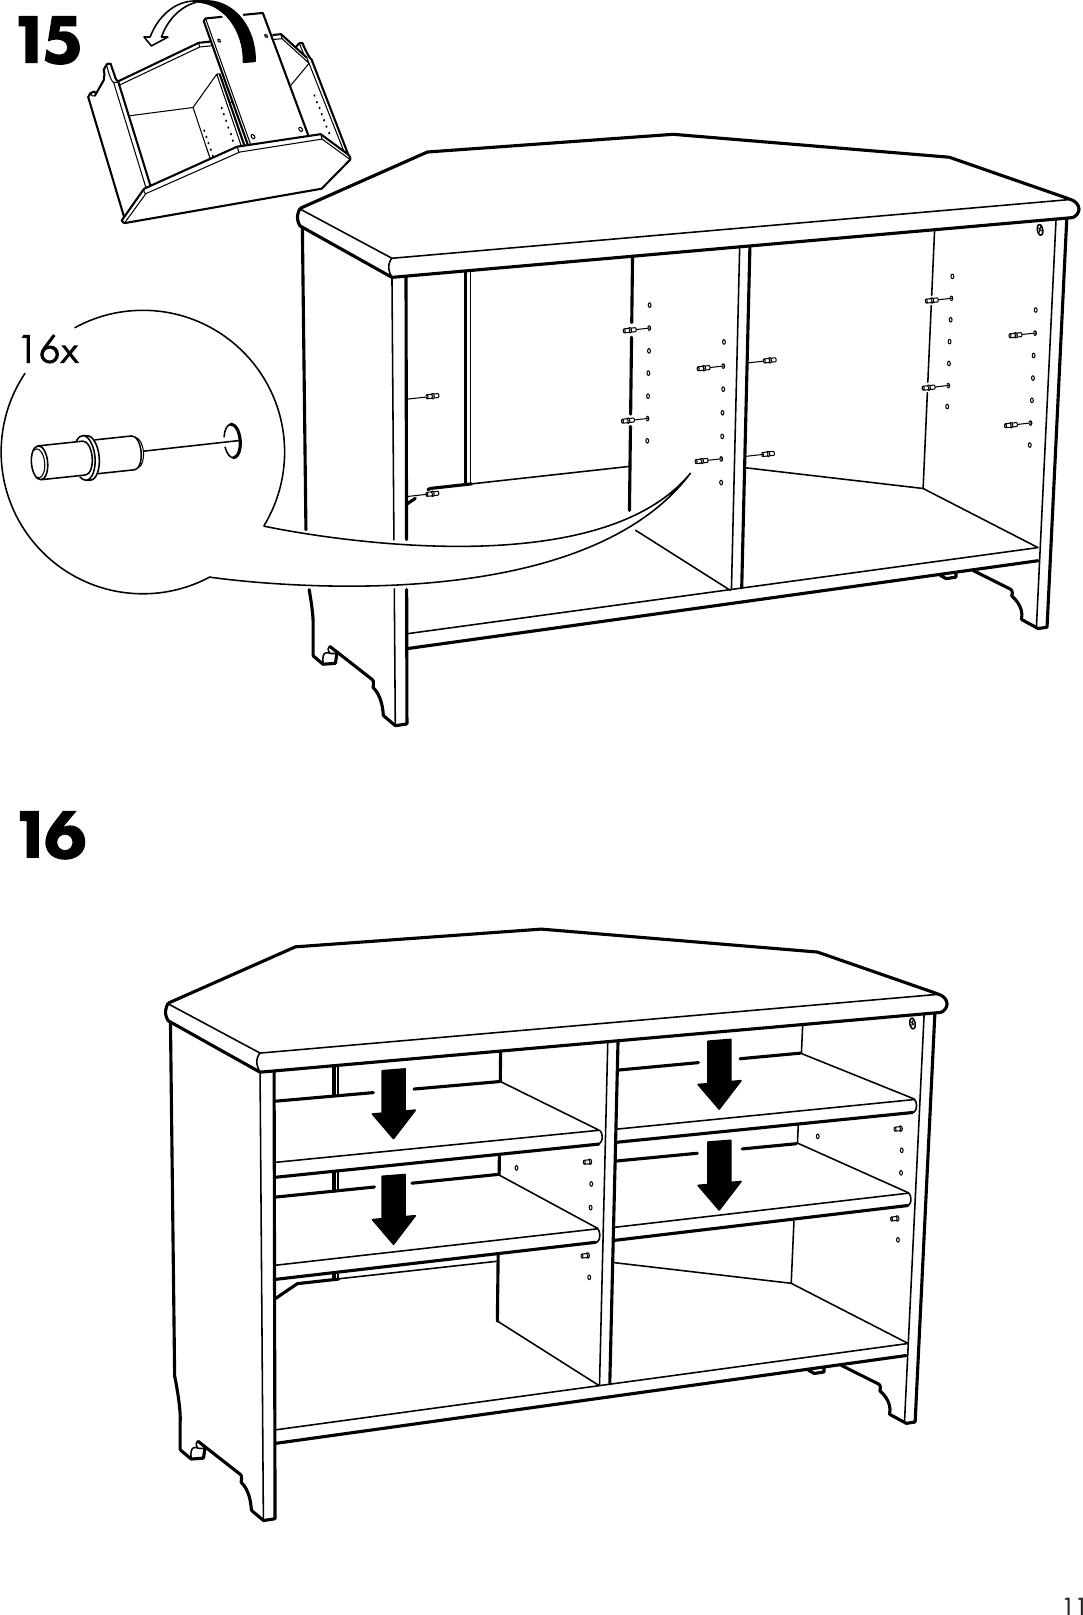 Ikea Leksvik Crib Instructions